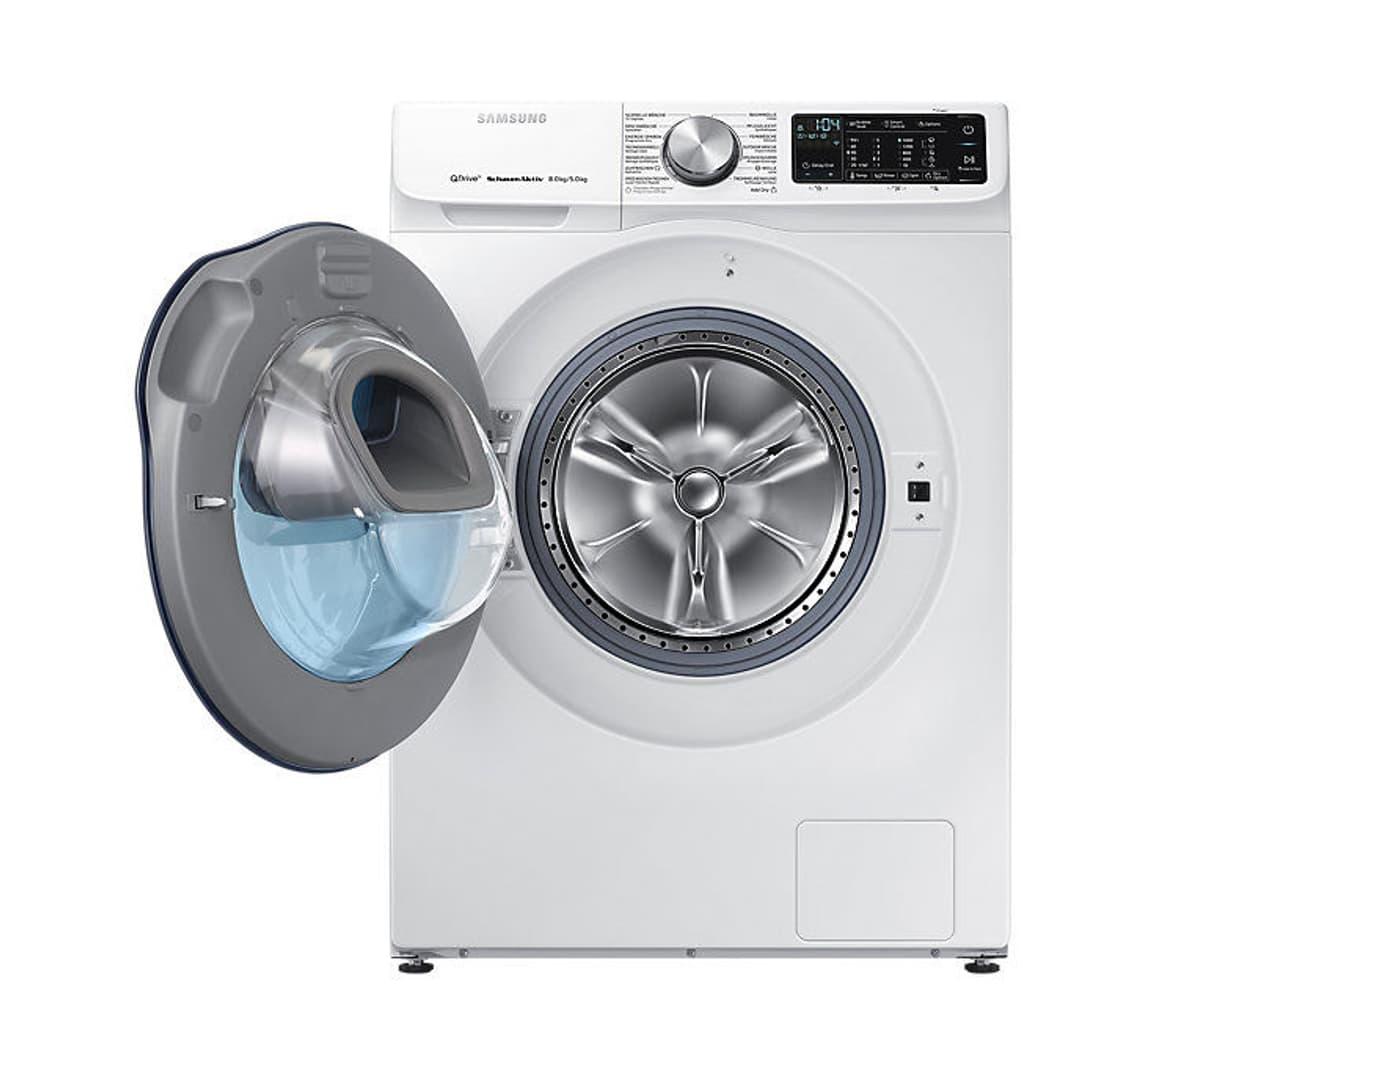 Samsung wd wd n oow ws quickdrive waschmaschine trockner